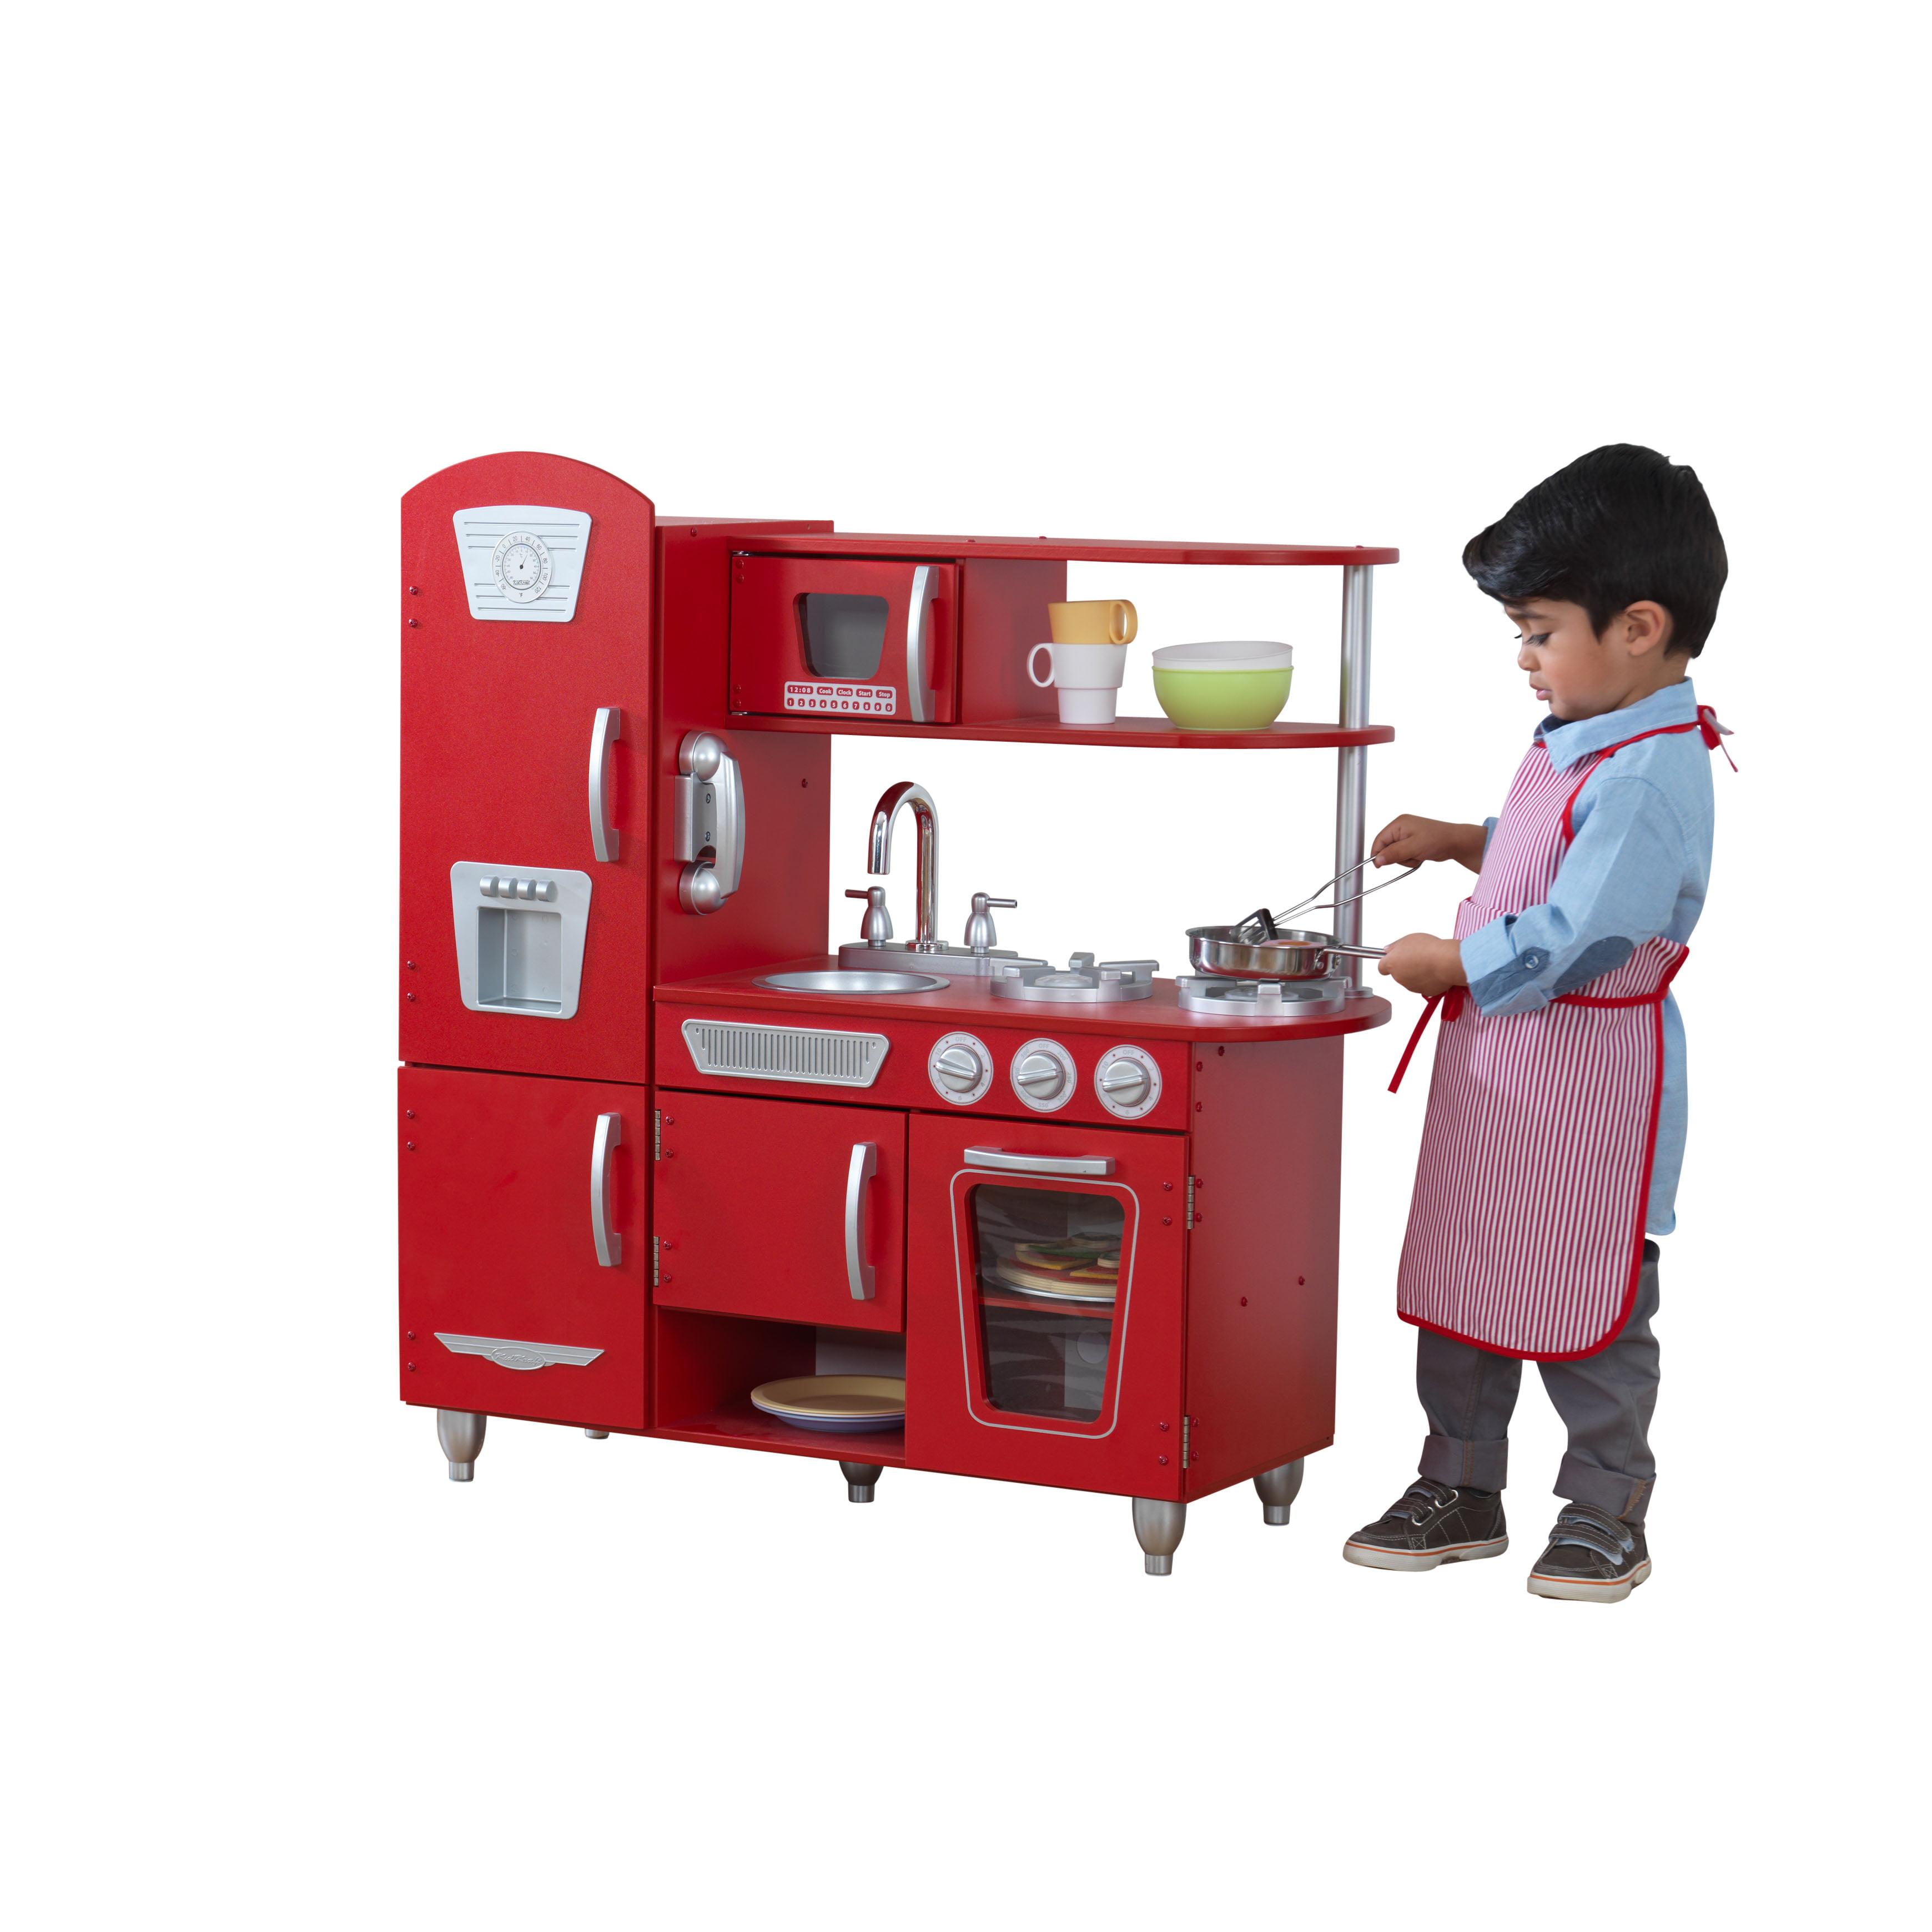 KidKraft Vintage Play Kitchen Red by KidKraft